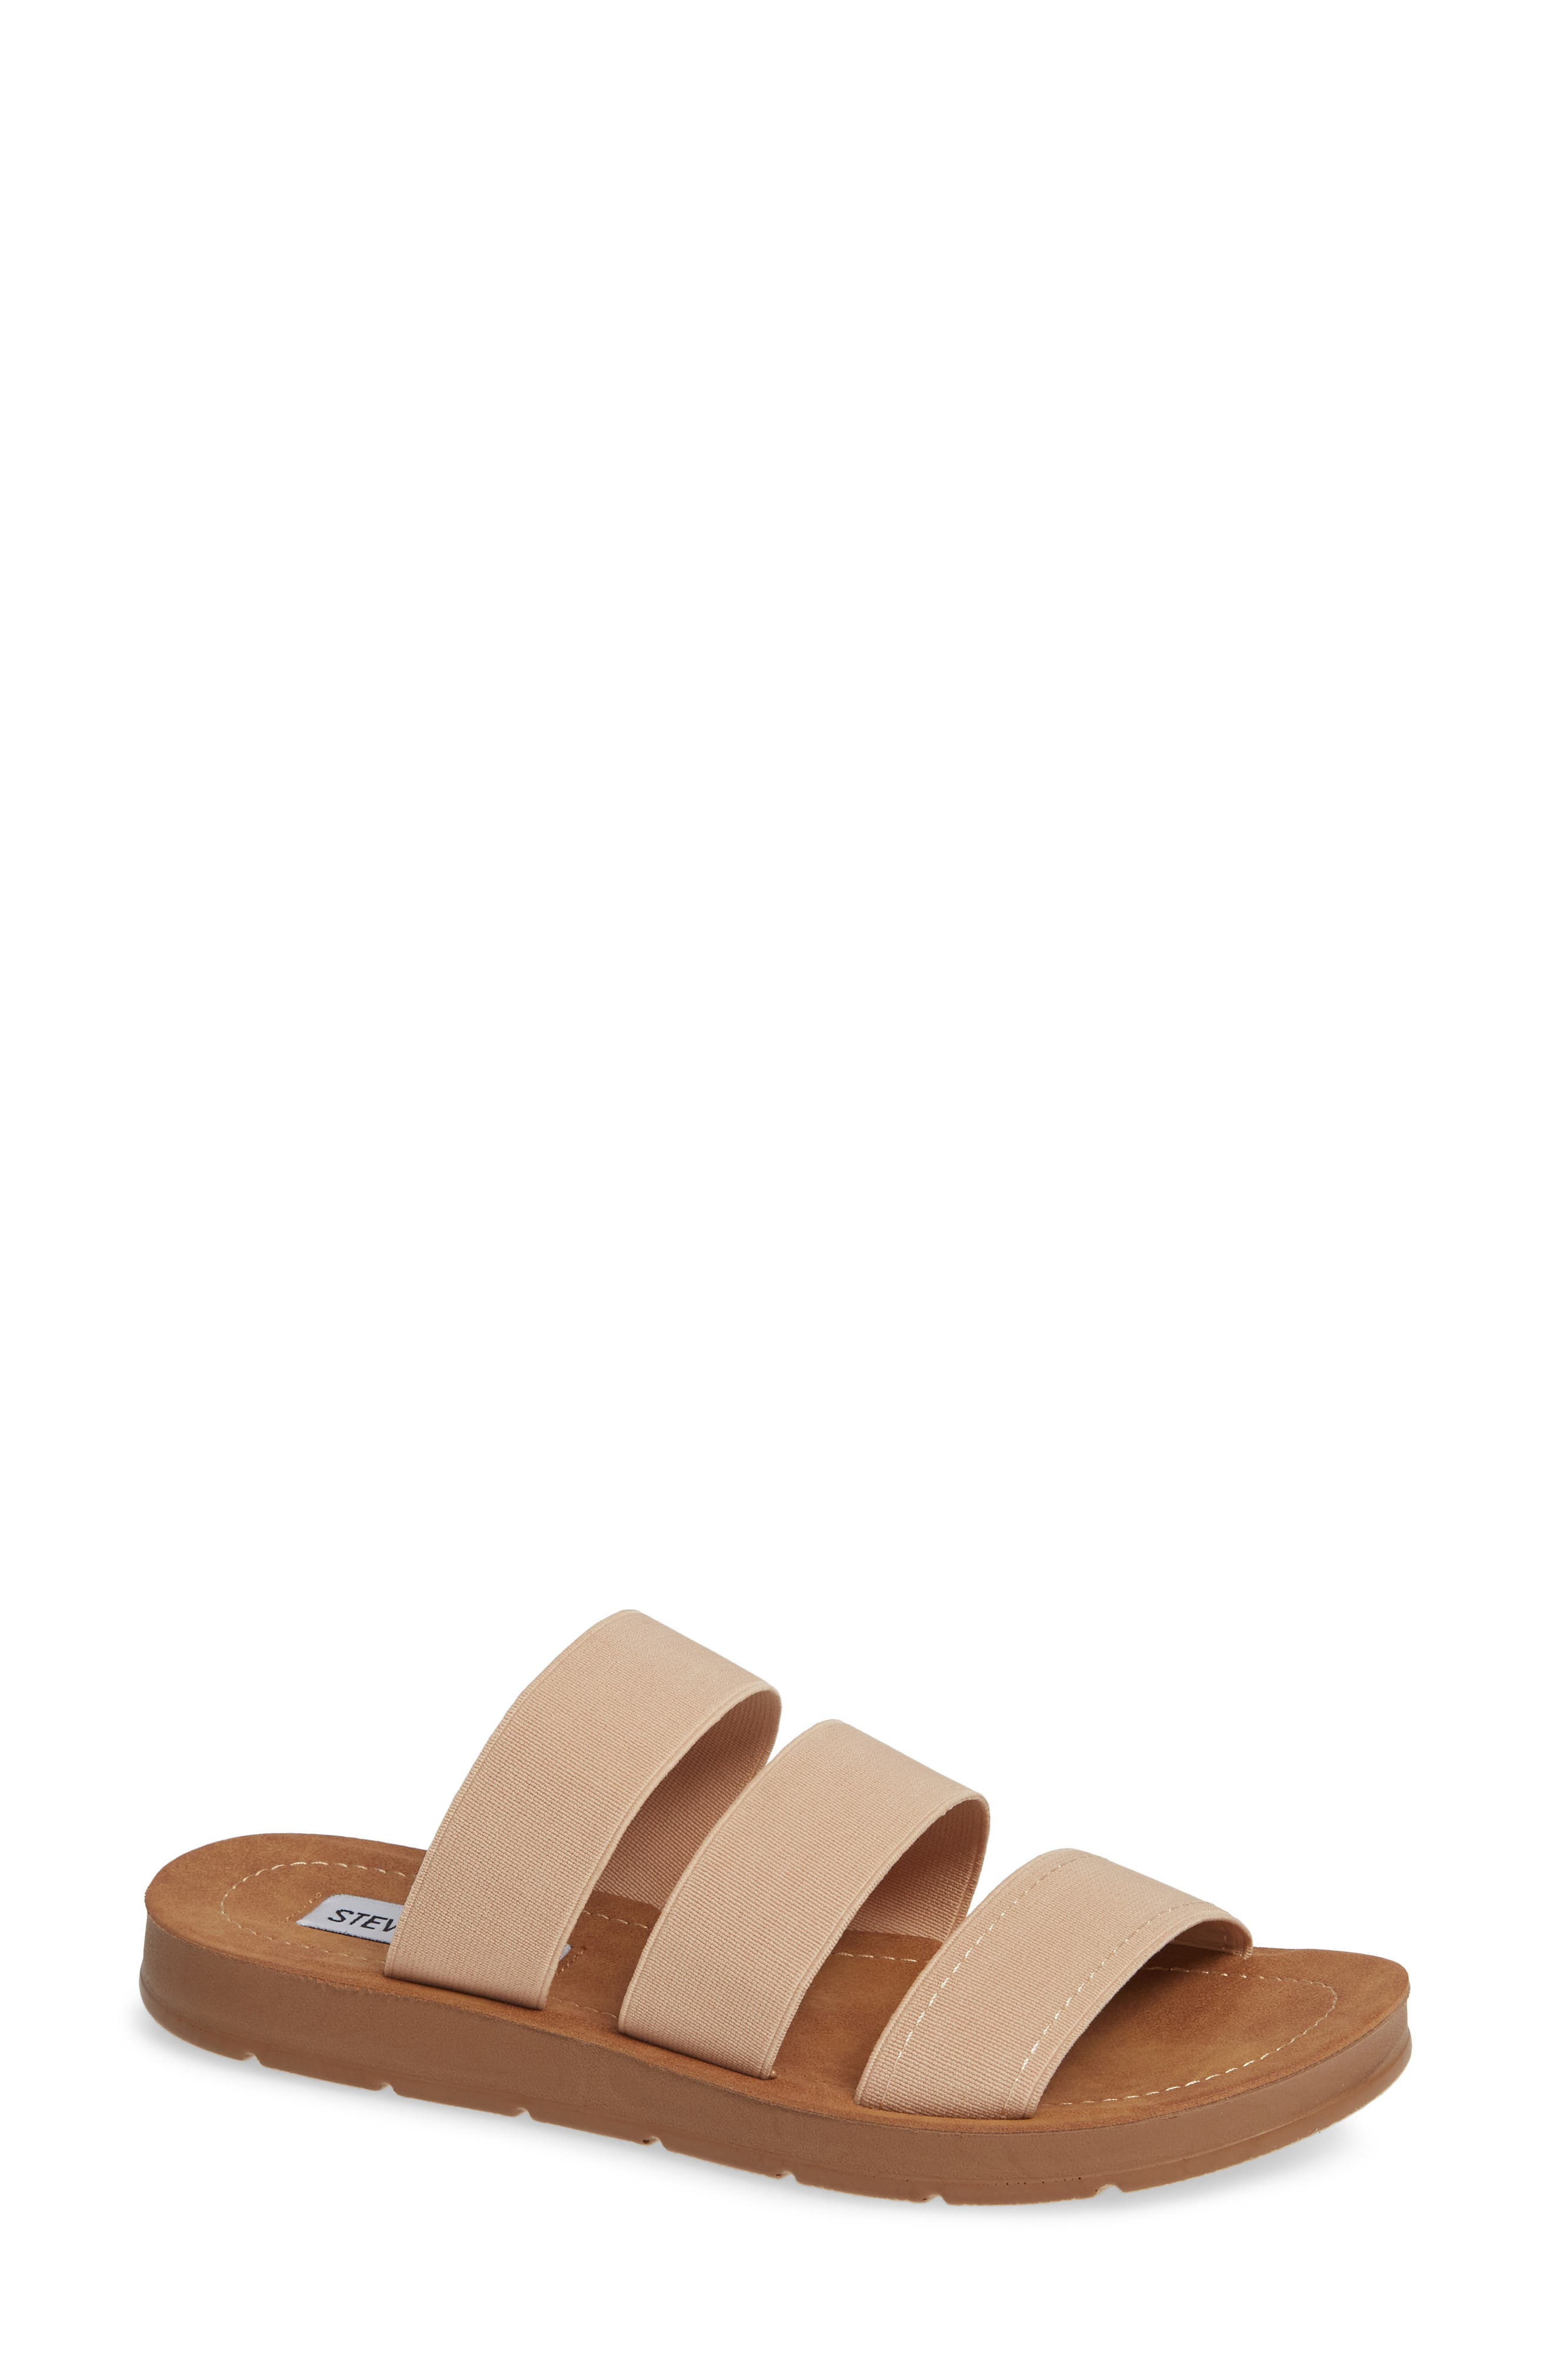 Pascale Slide Sandal, Main, color, BLUSH FABRIC